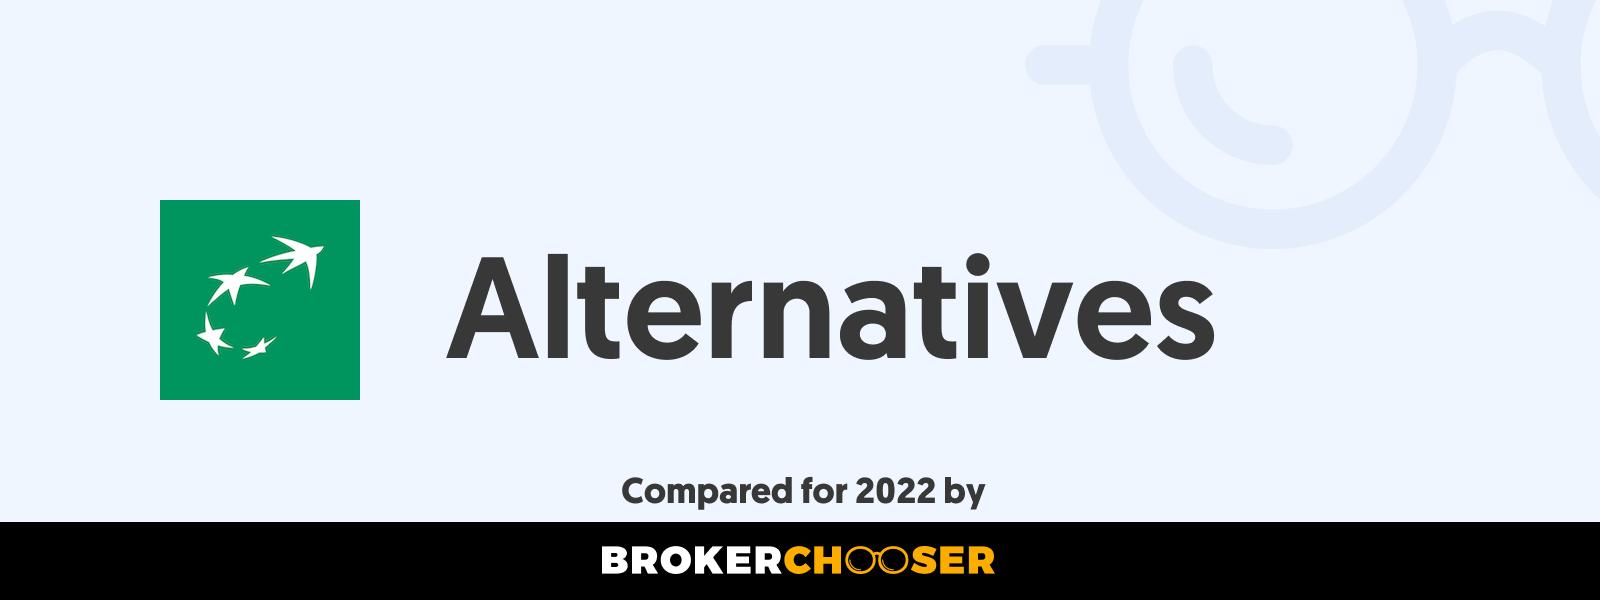 BGL BNP Paribas Alternatives